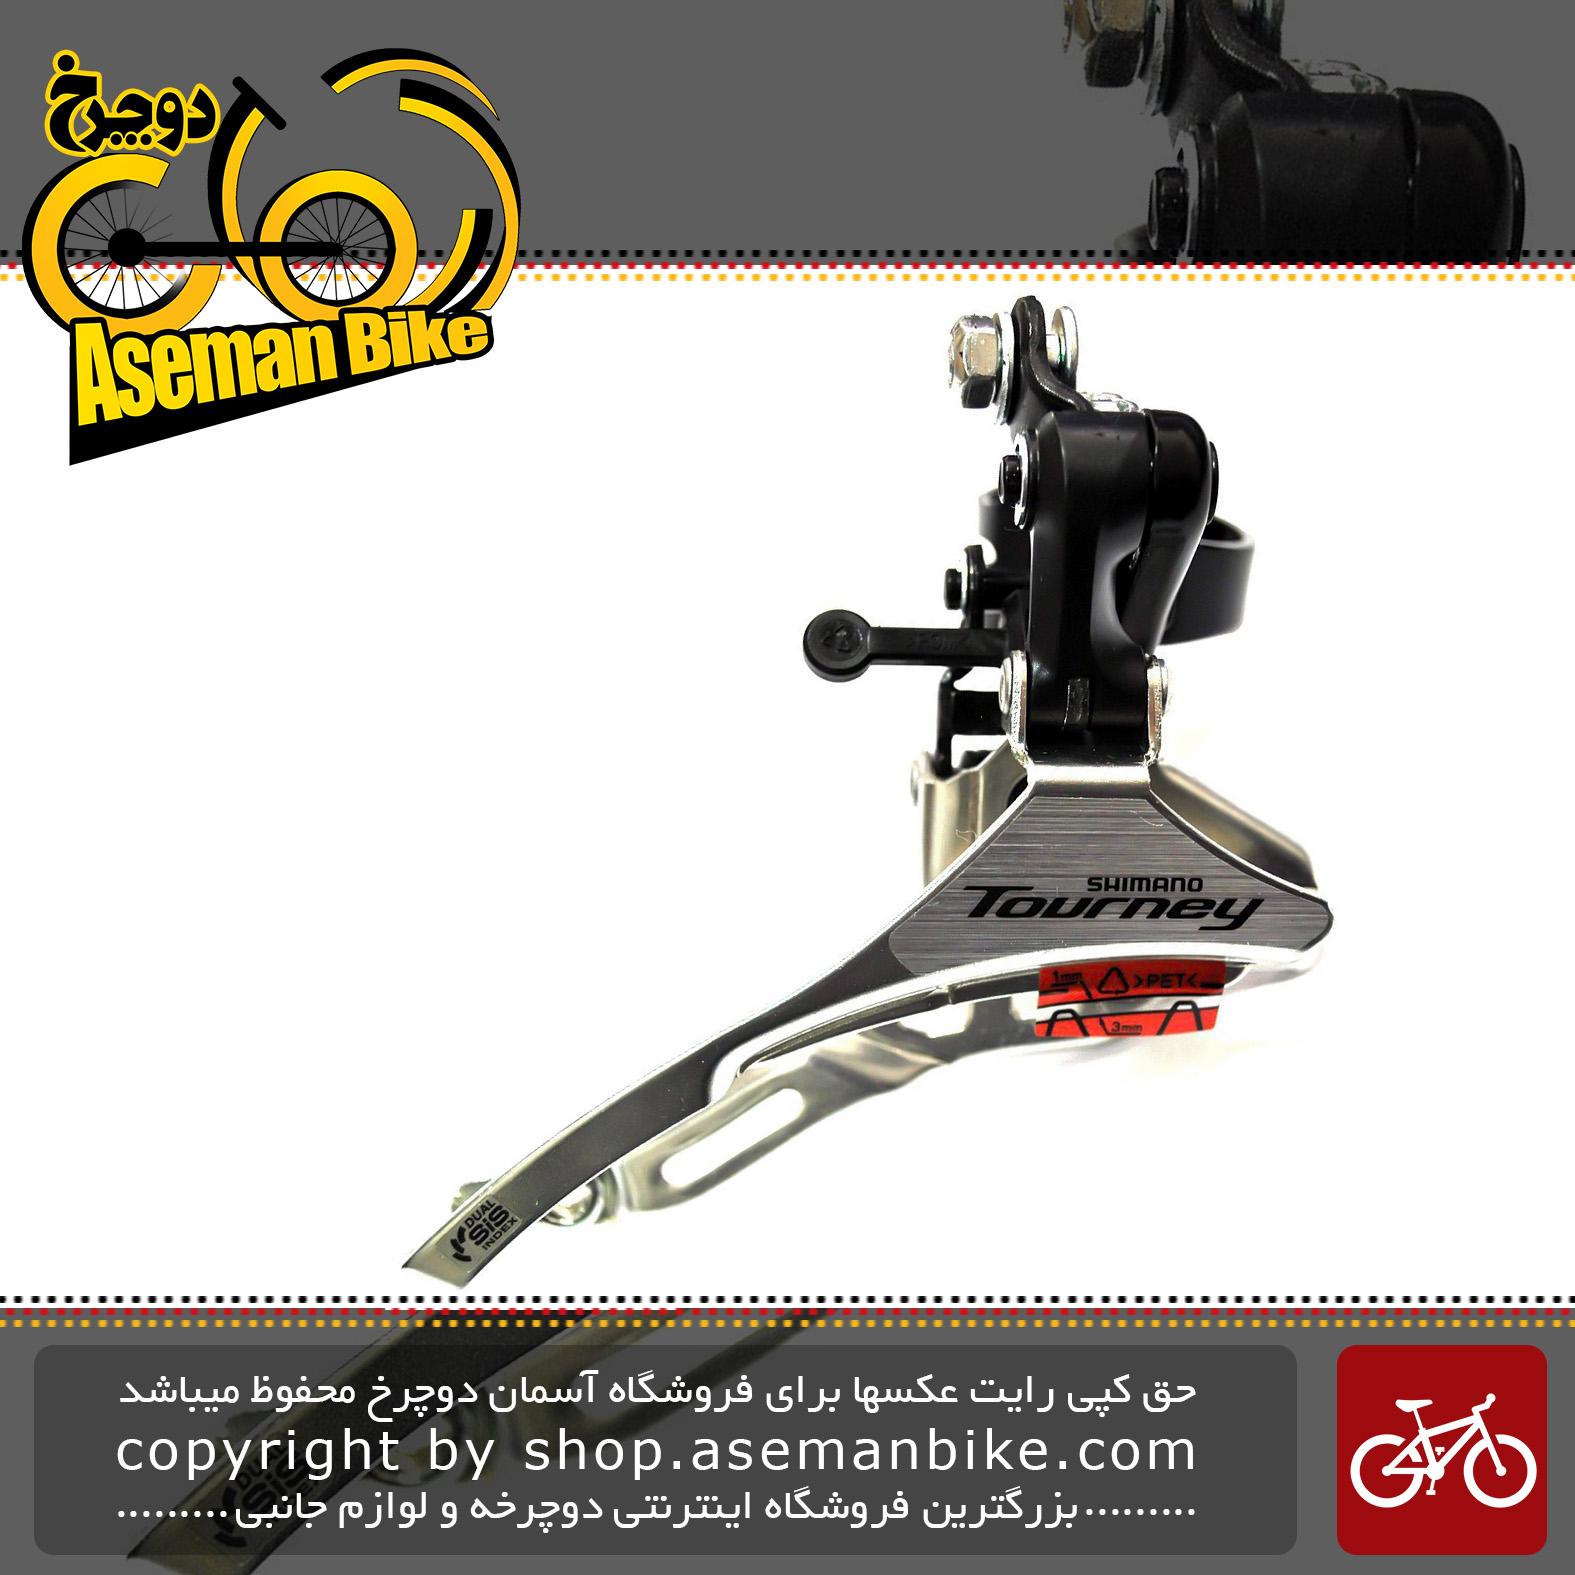 طبق عوض کن دوچرخه شیمانو تورنی Shimano TOURNEY FD-TY10 Front Derailleur (3x7-6-speed)